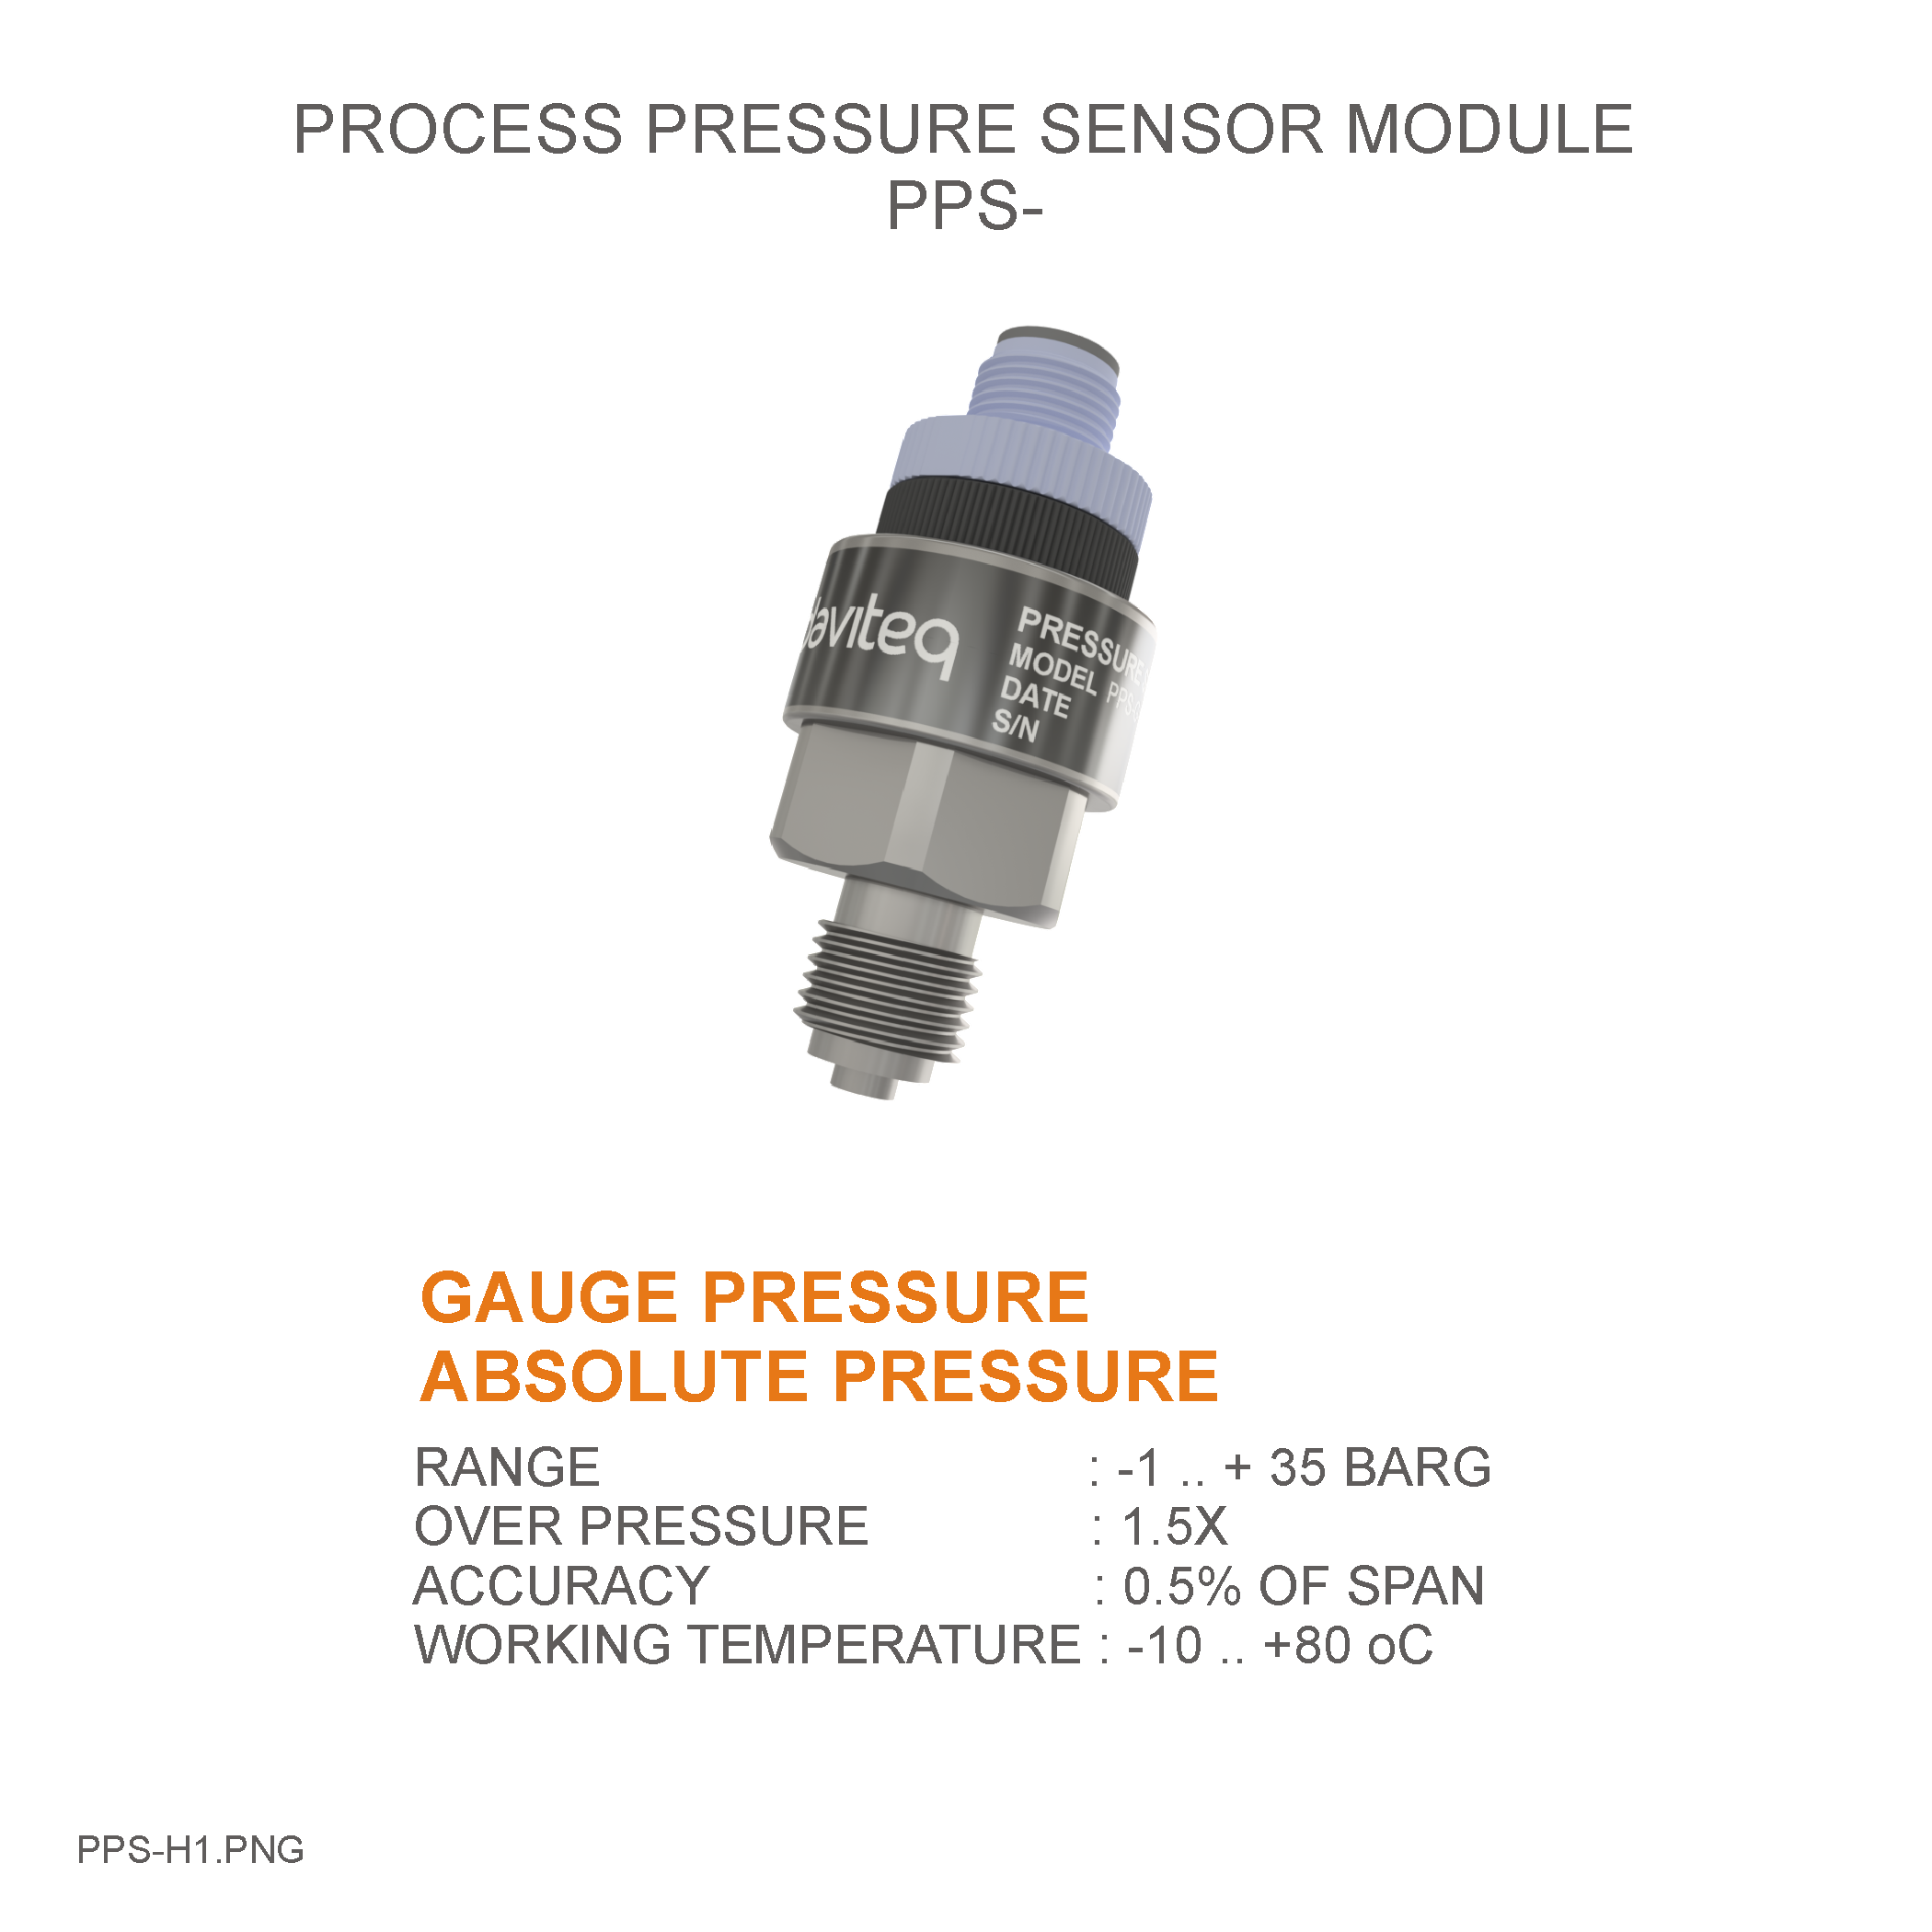 Module cảm biến đo áp suất Process